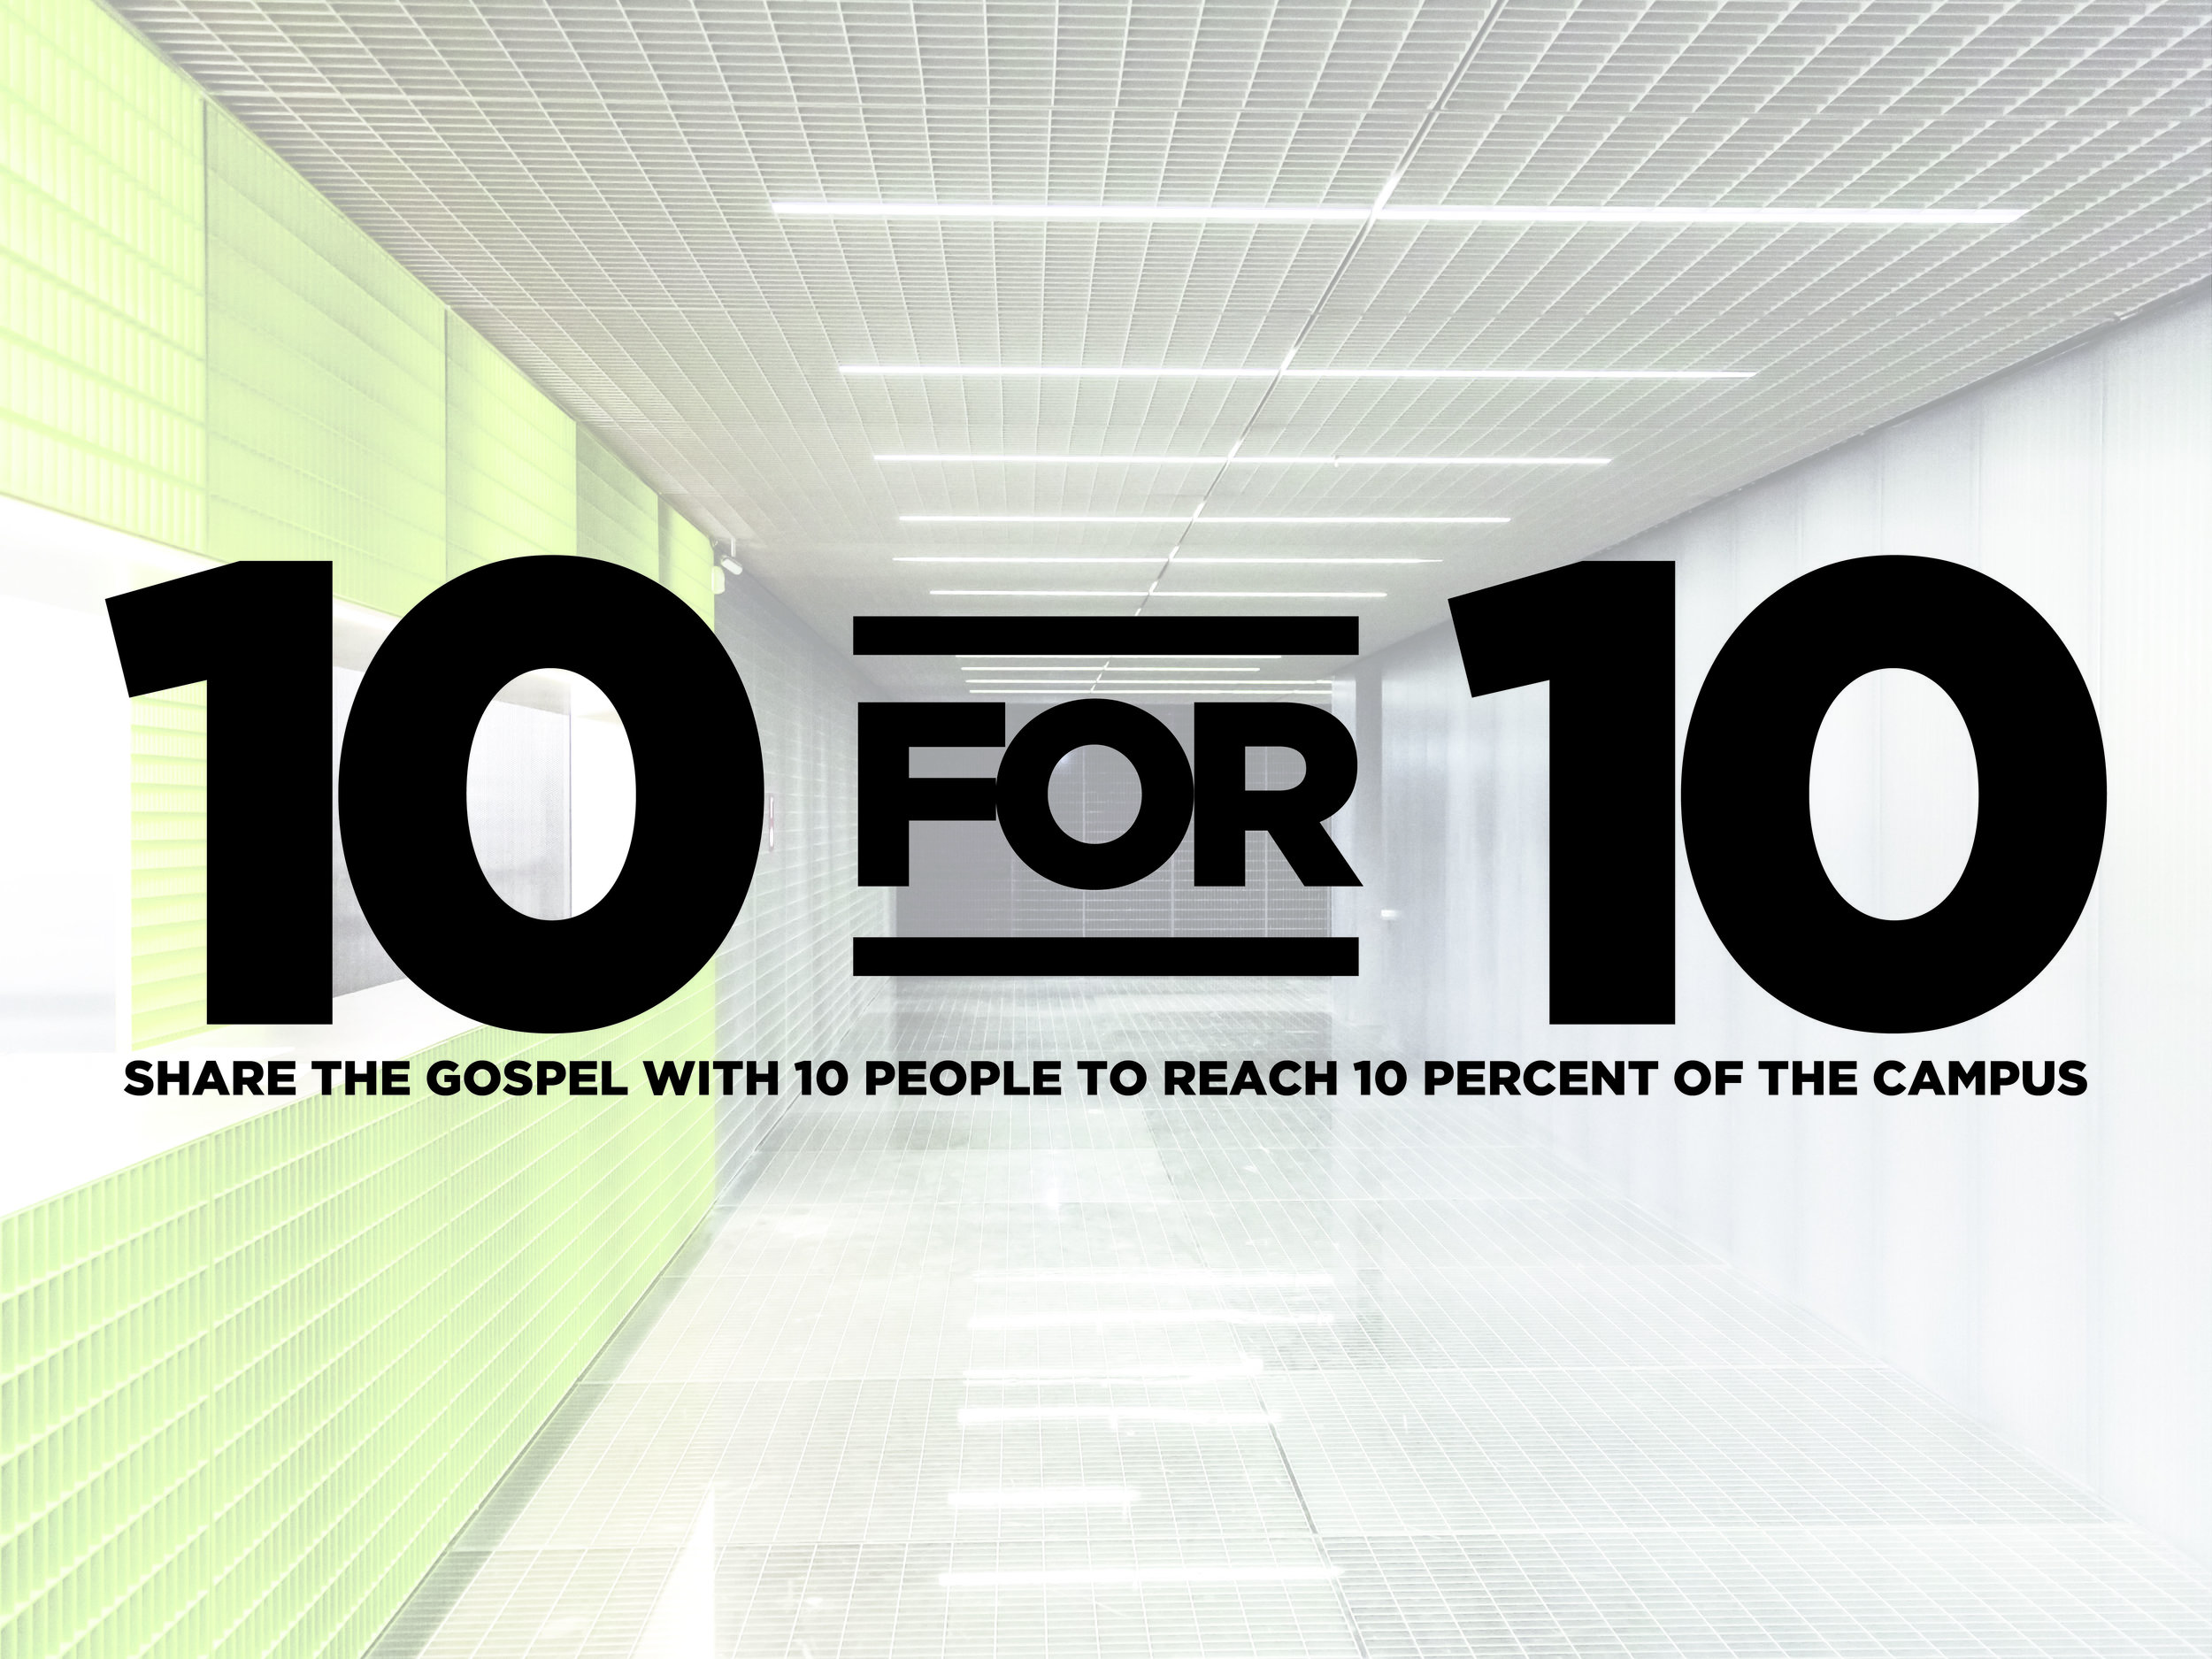 10 for 10 Promo Graphci-01.jpg